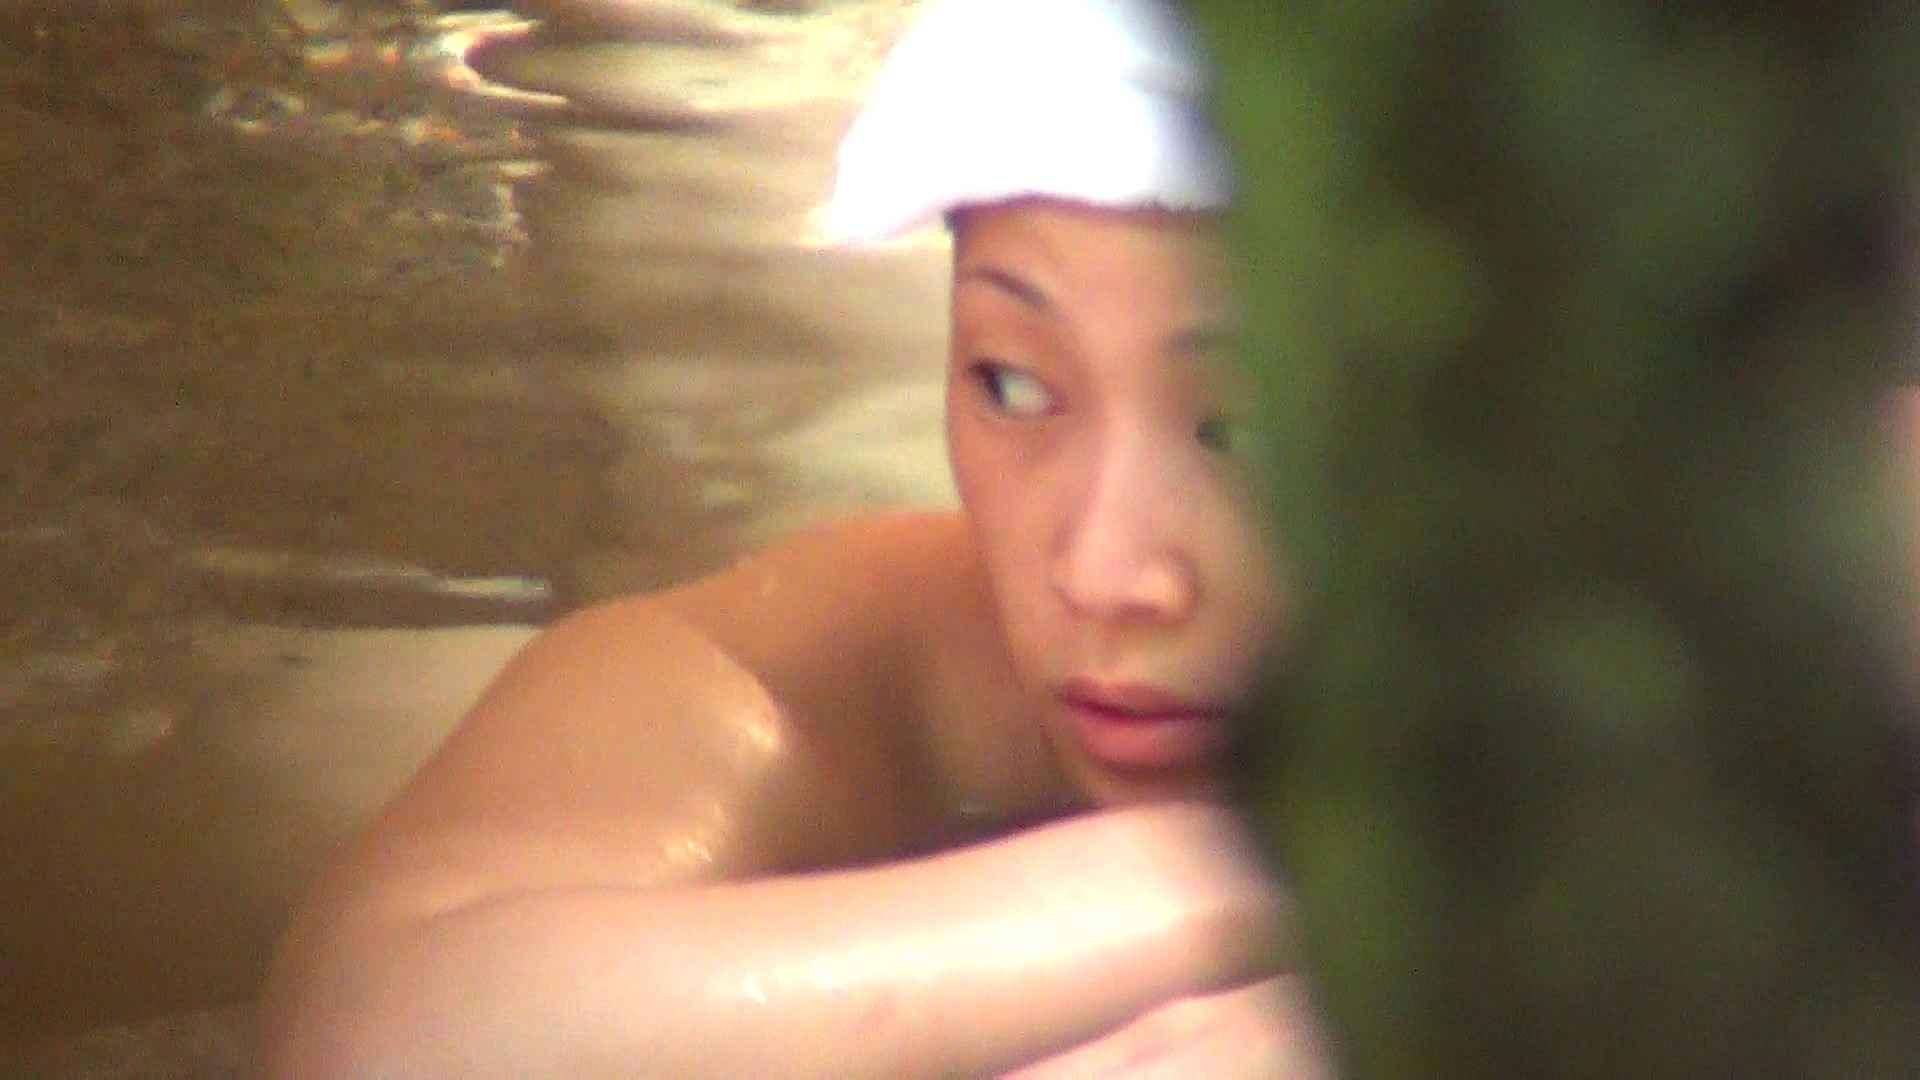 Vol.51 醤油j顔のお女市さん 胸の割りに下半身はがっちりタイプ 細身体型  80枚 25